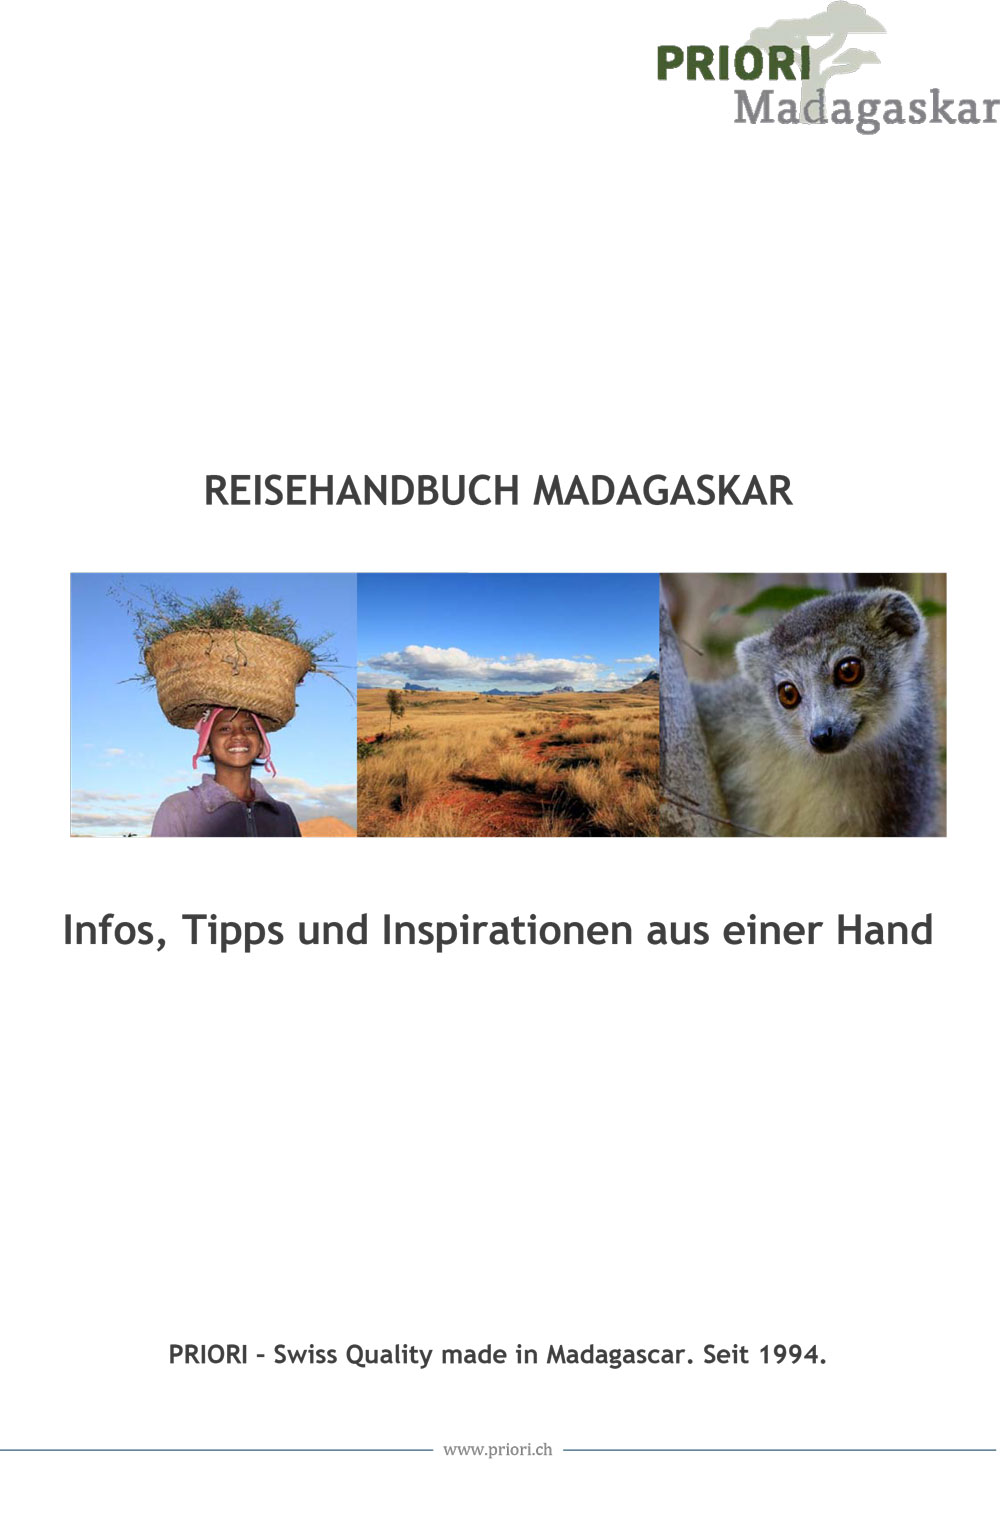 Reisehandbuch Madagaskar PRIORI Reisen